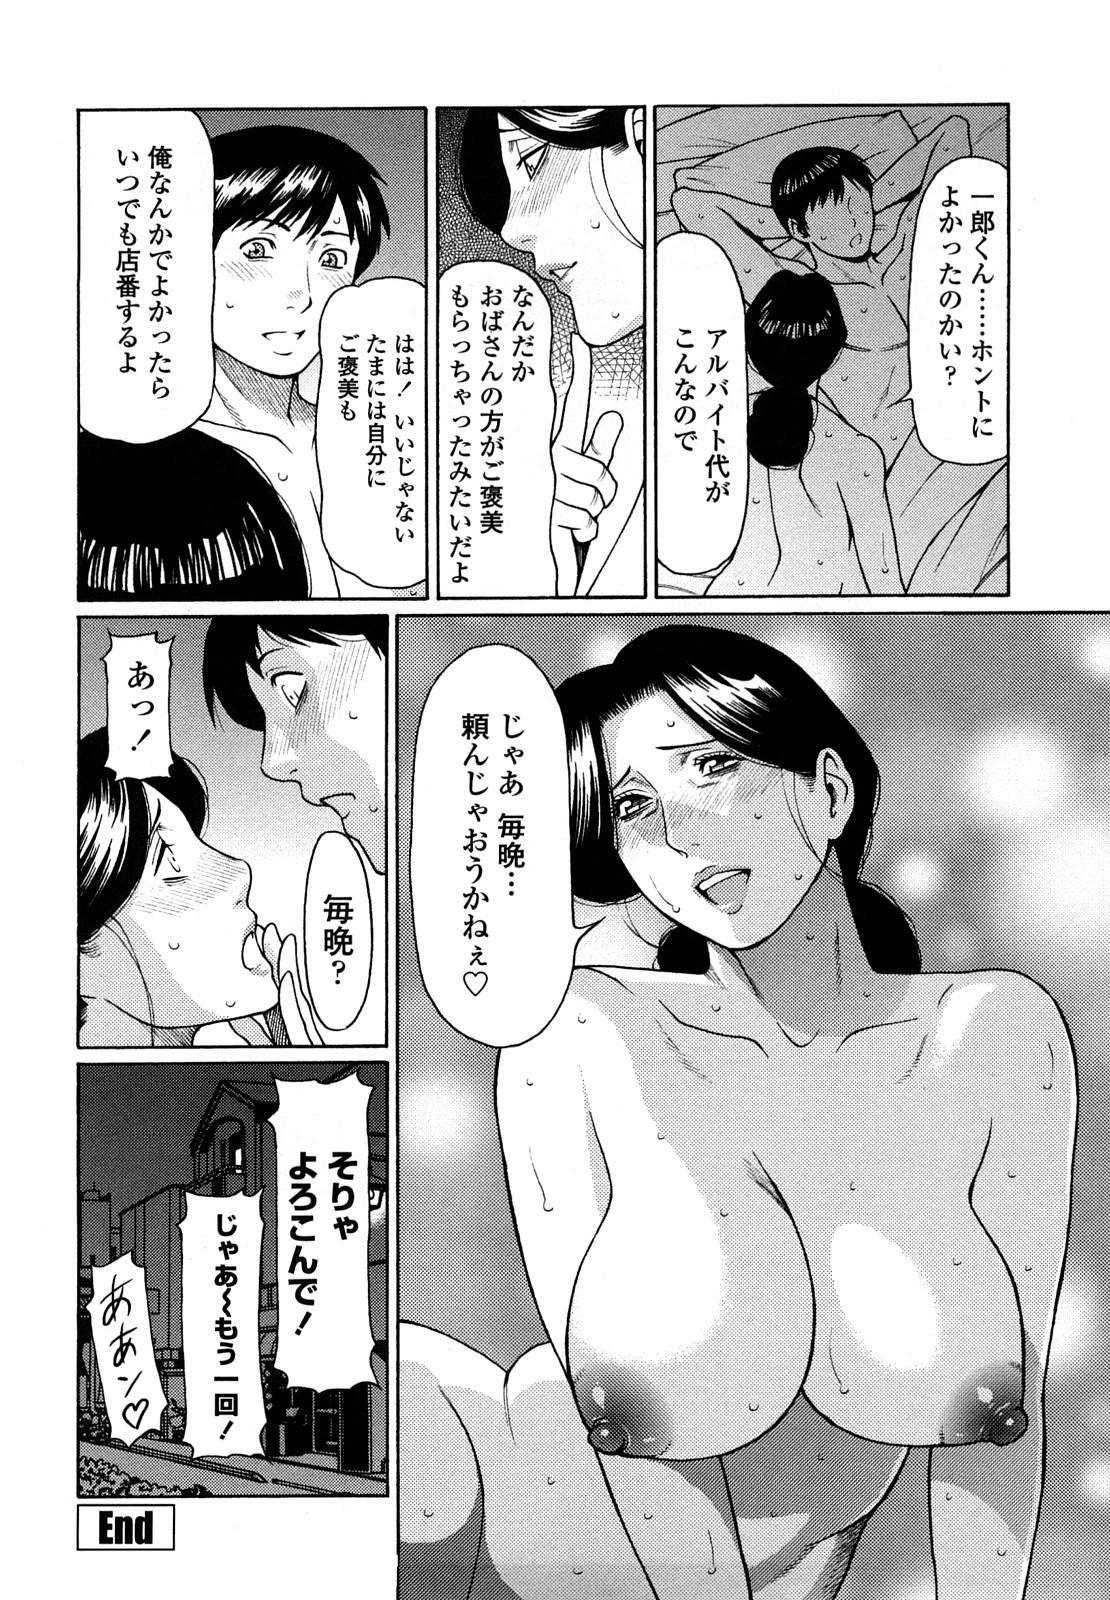 [Takasugi Kou] Kindan no Haha-Ana - Immorality Love-Hole [Decensored] 137